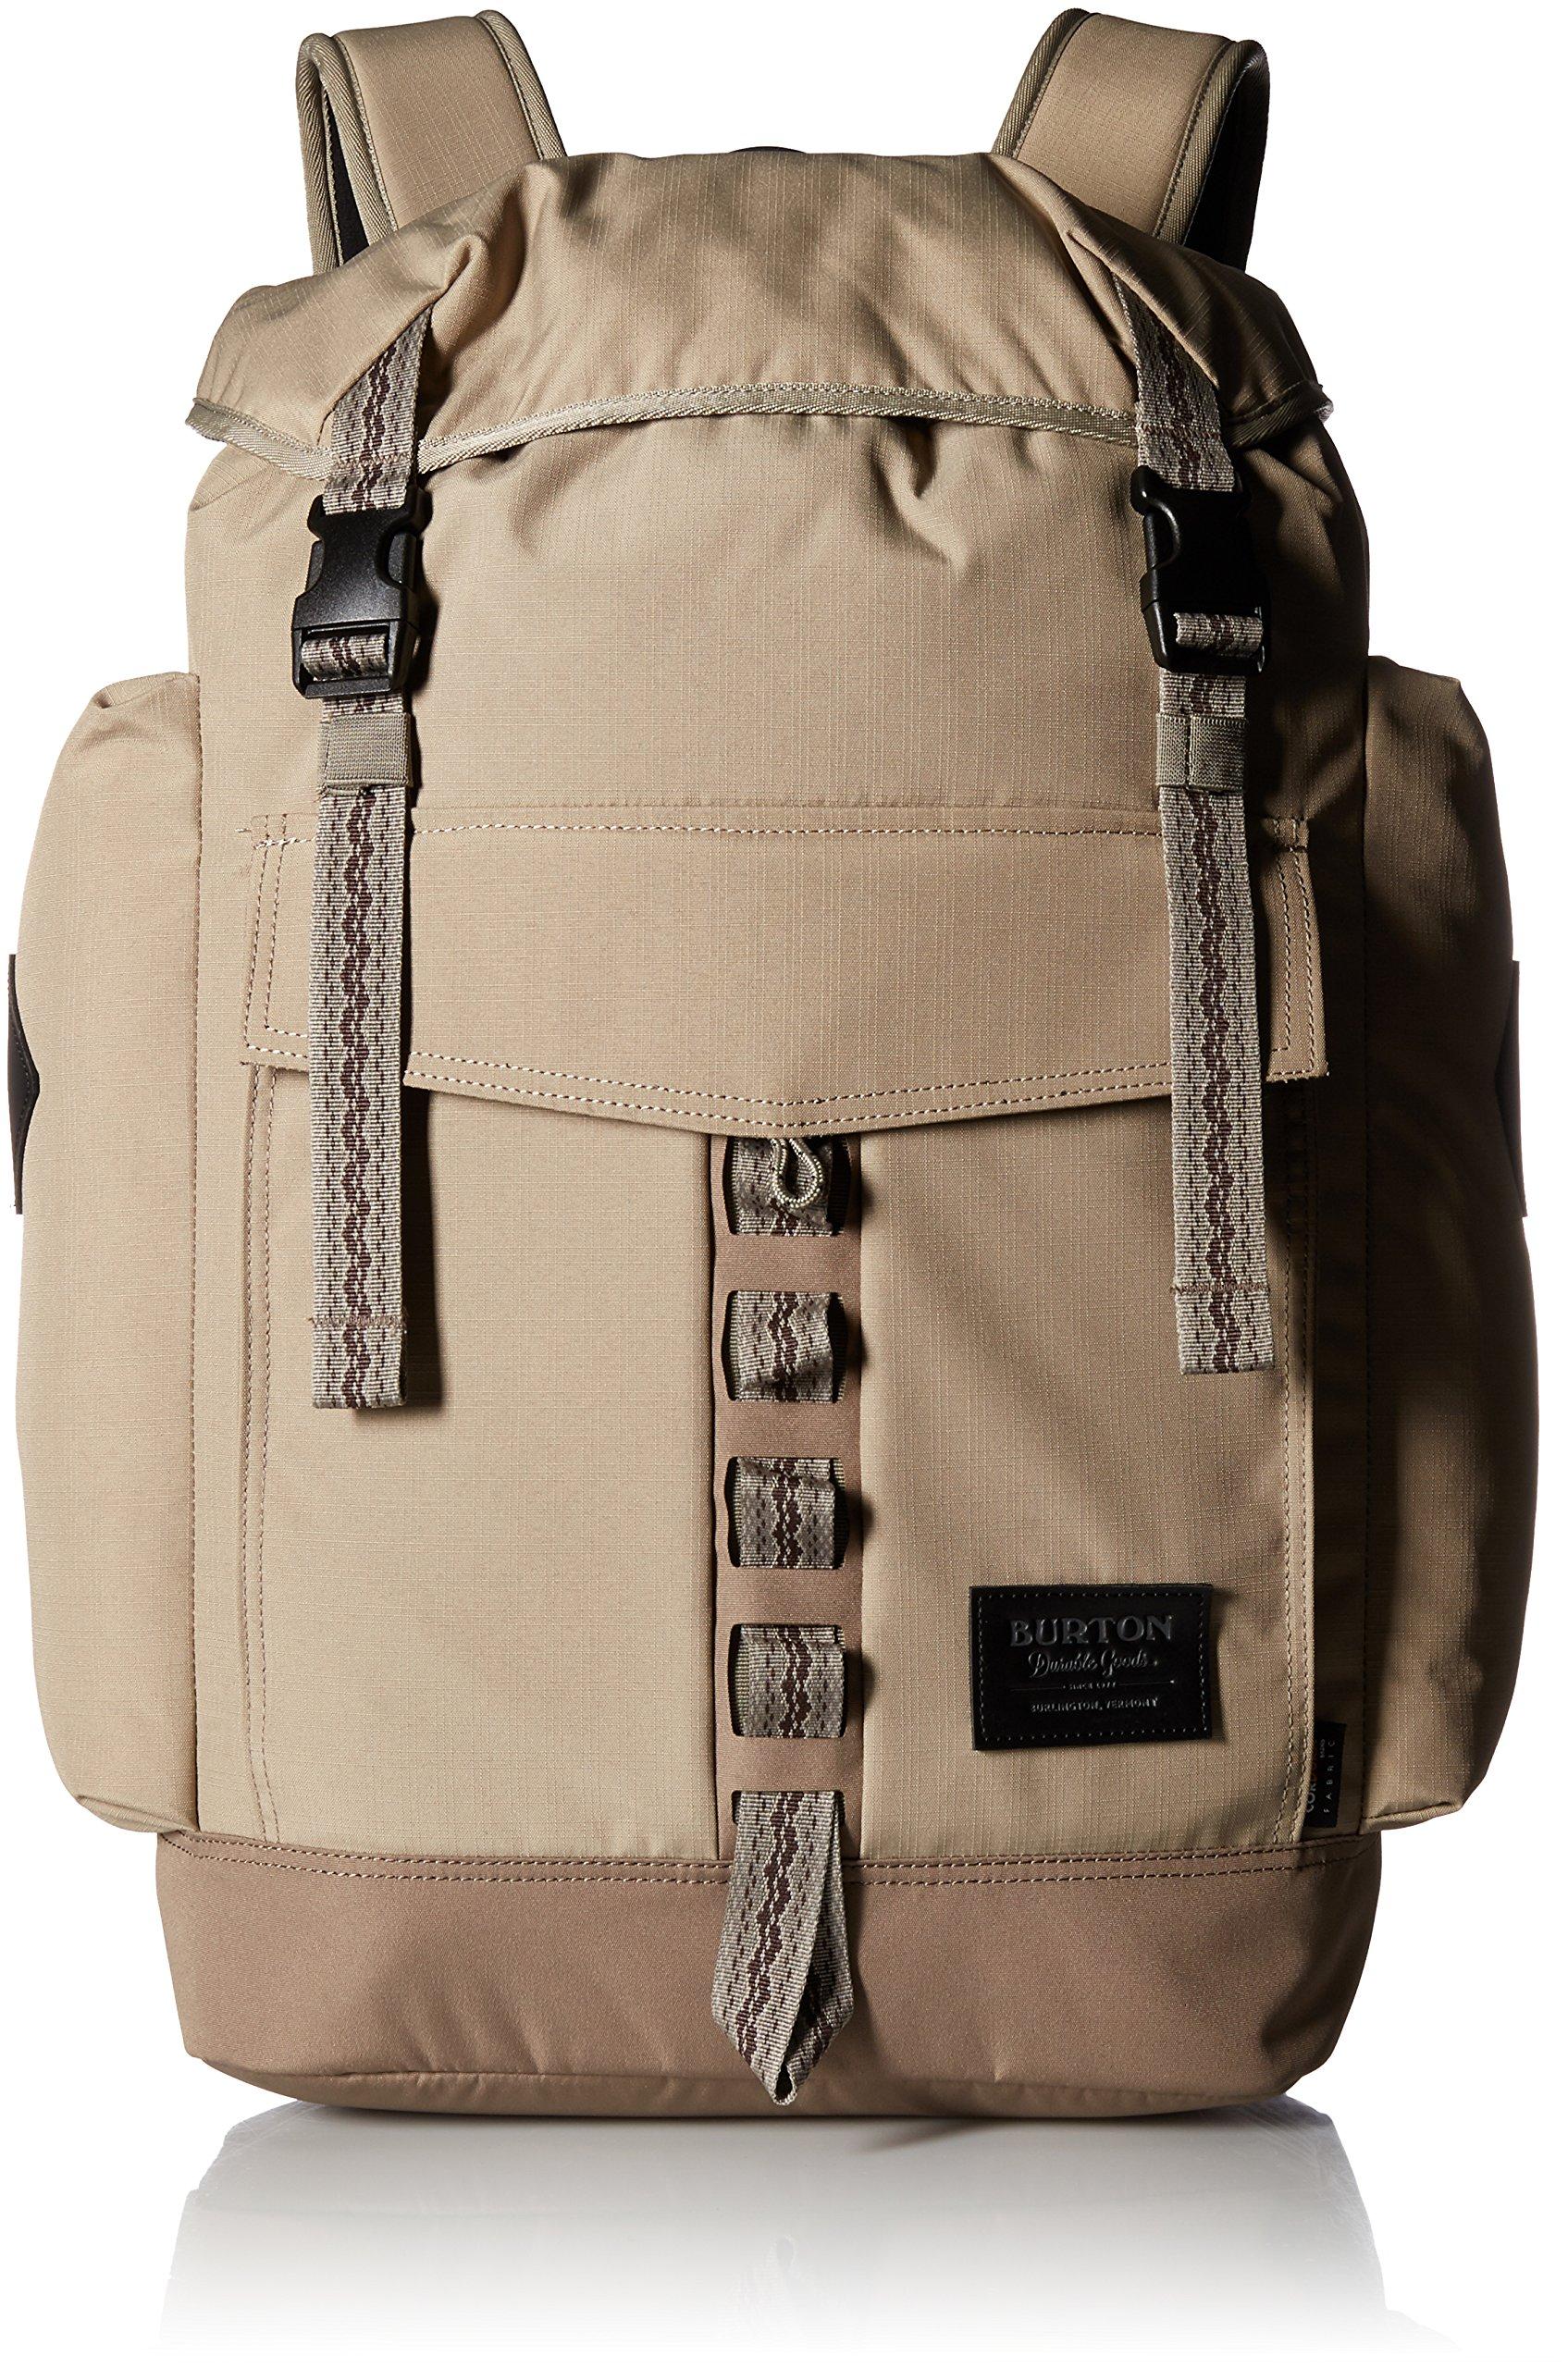 Burton Fathom Backpack, Aluminum Triple Rip Cordura, One Size